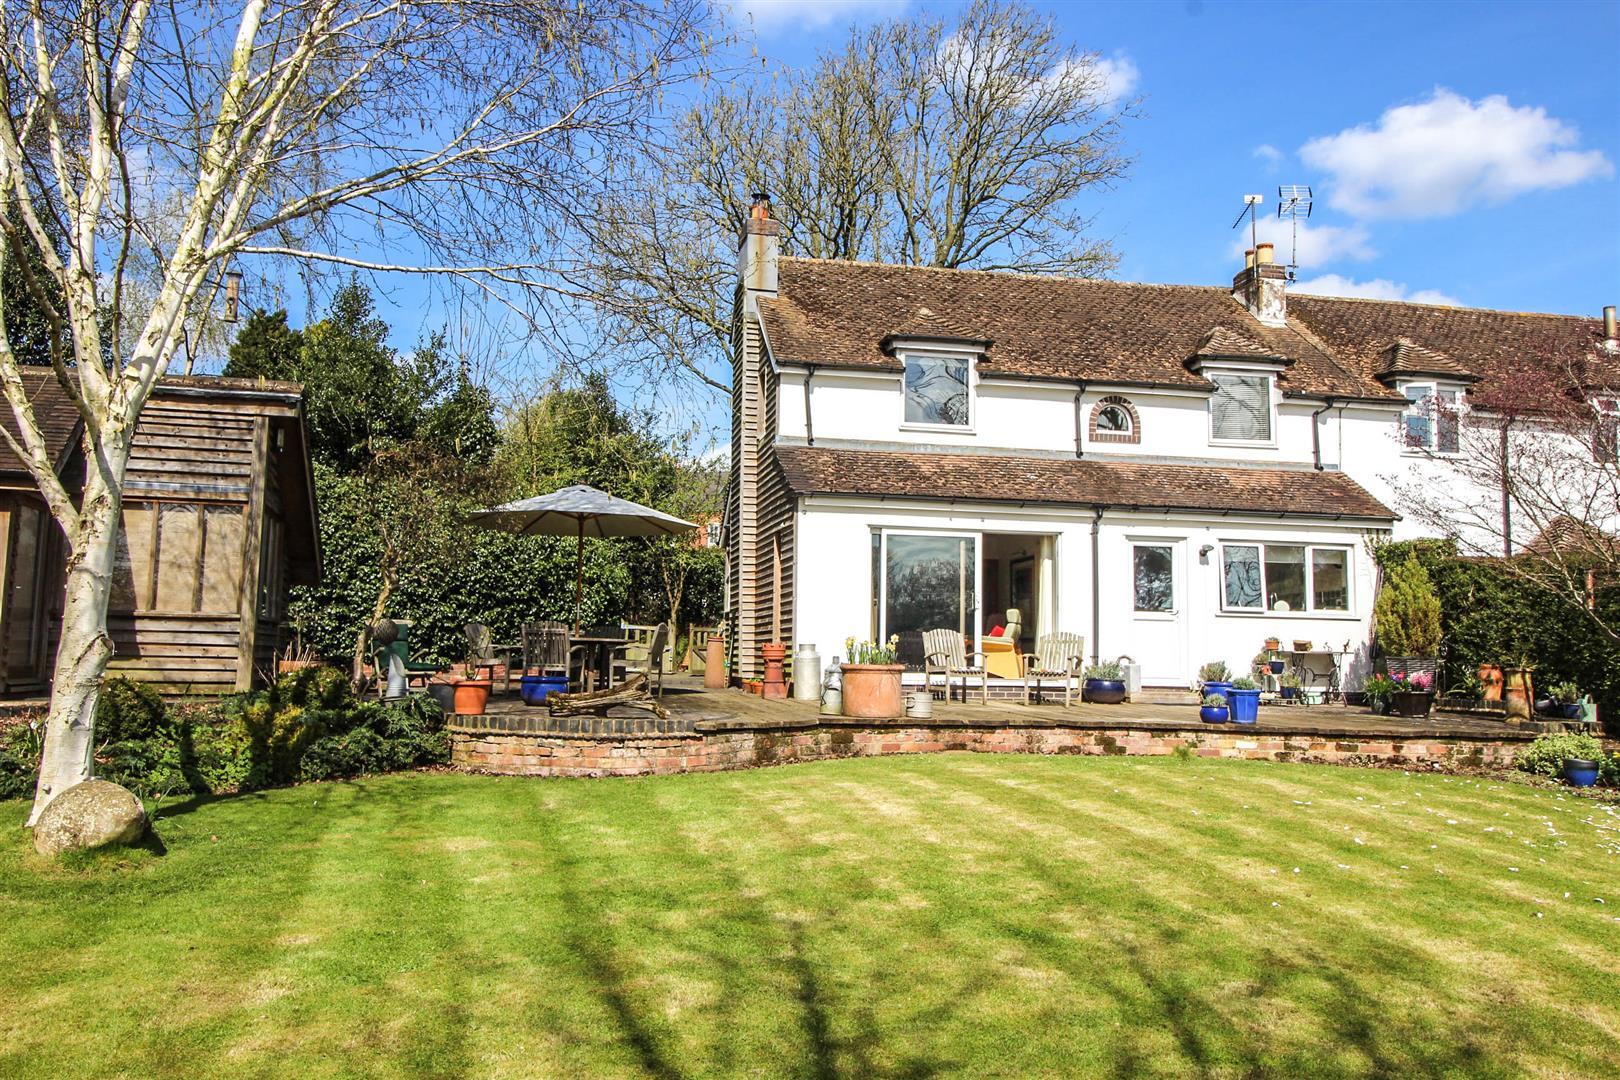 2 Bedrooms Property for sale in Feckenham Road, Astwood Bank, Redditch